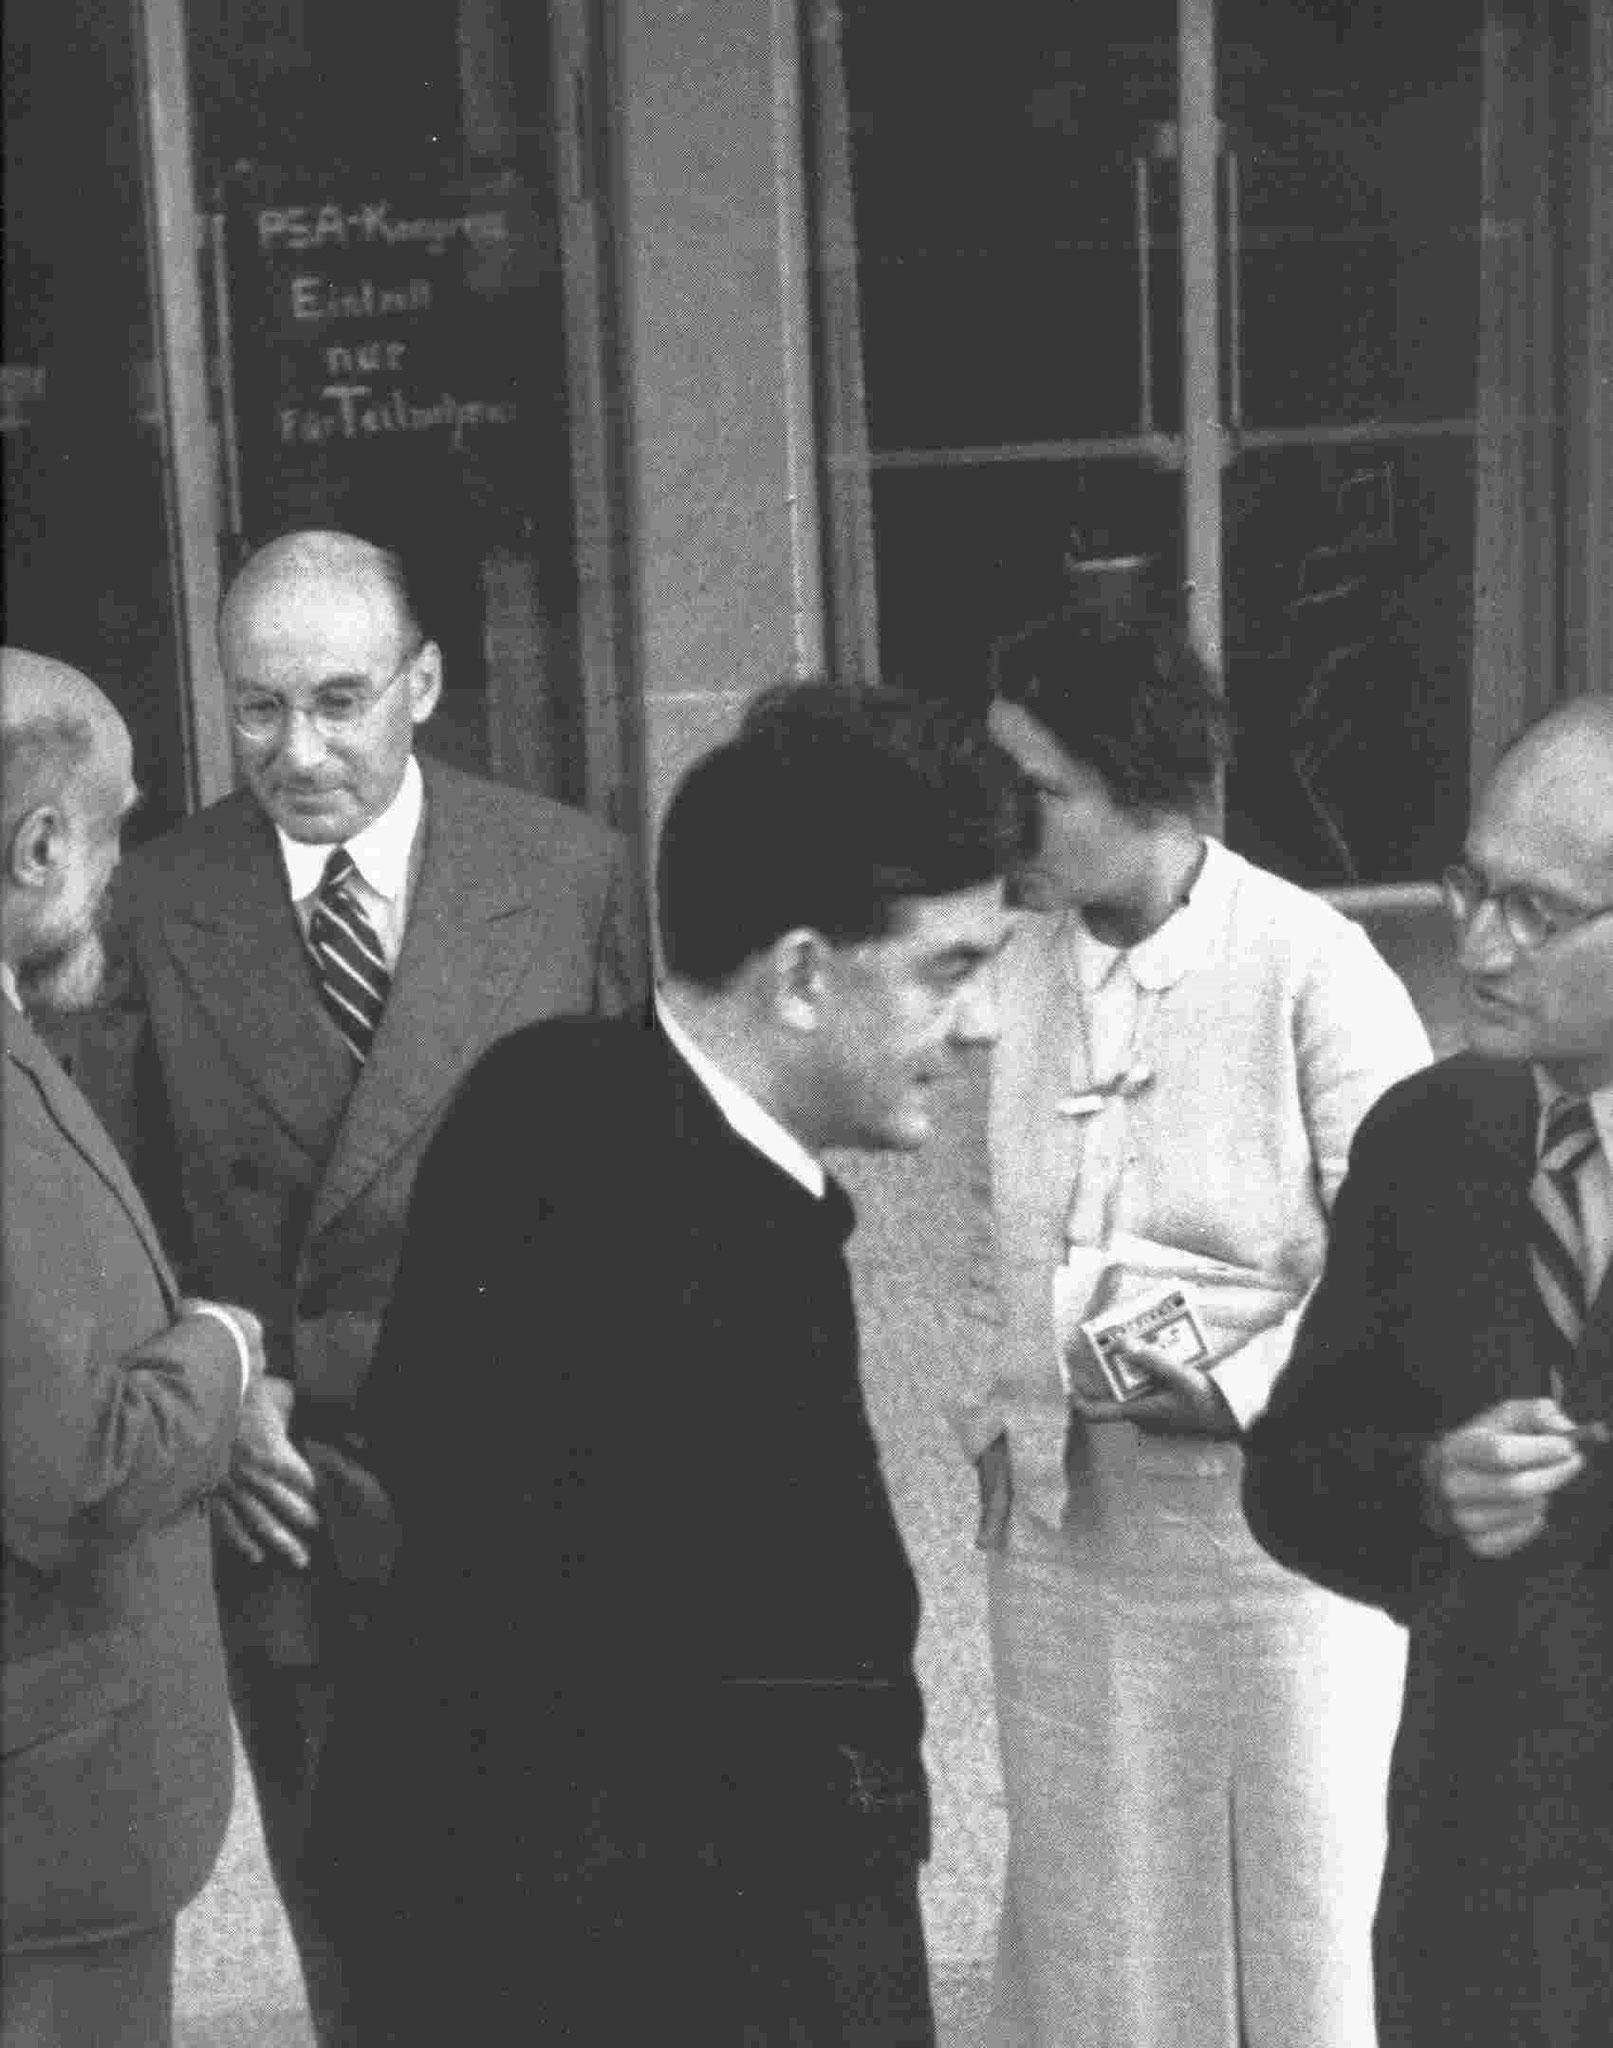 3. René Spitz mit Paul Federn; Heinrich Meng mit Eduardo Weiss, IPV-Kongress 1934, Luzern